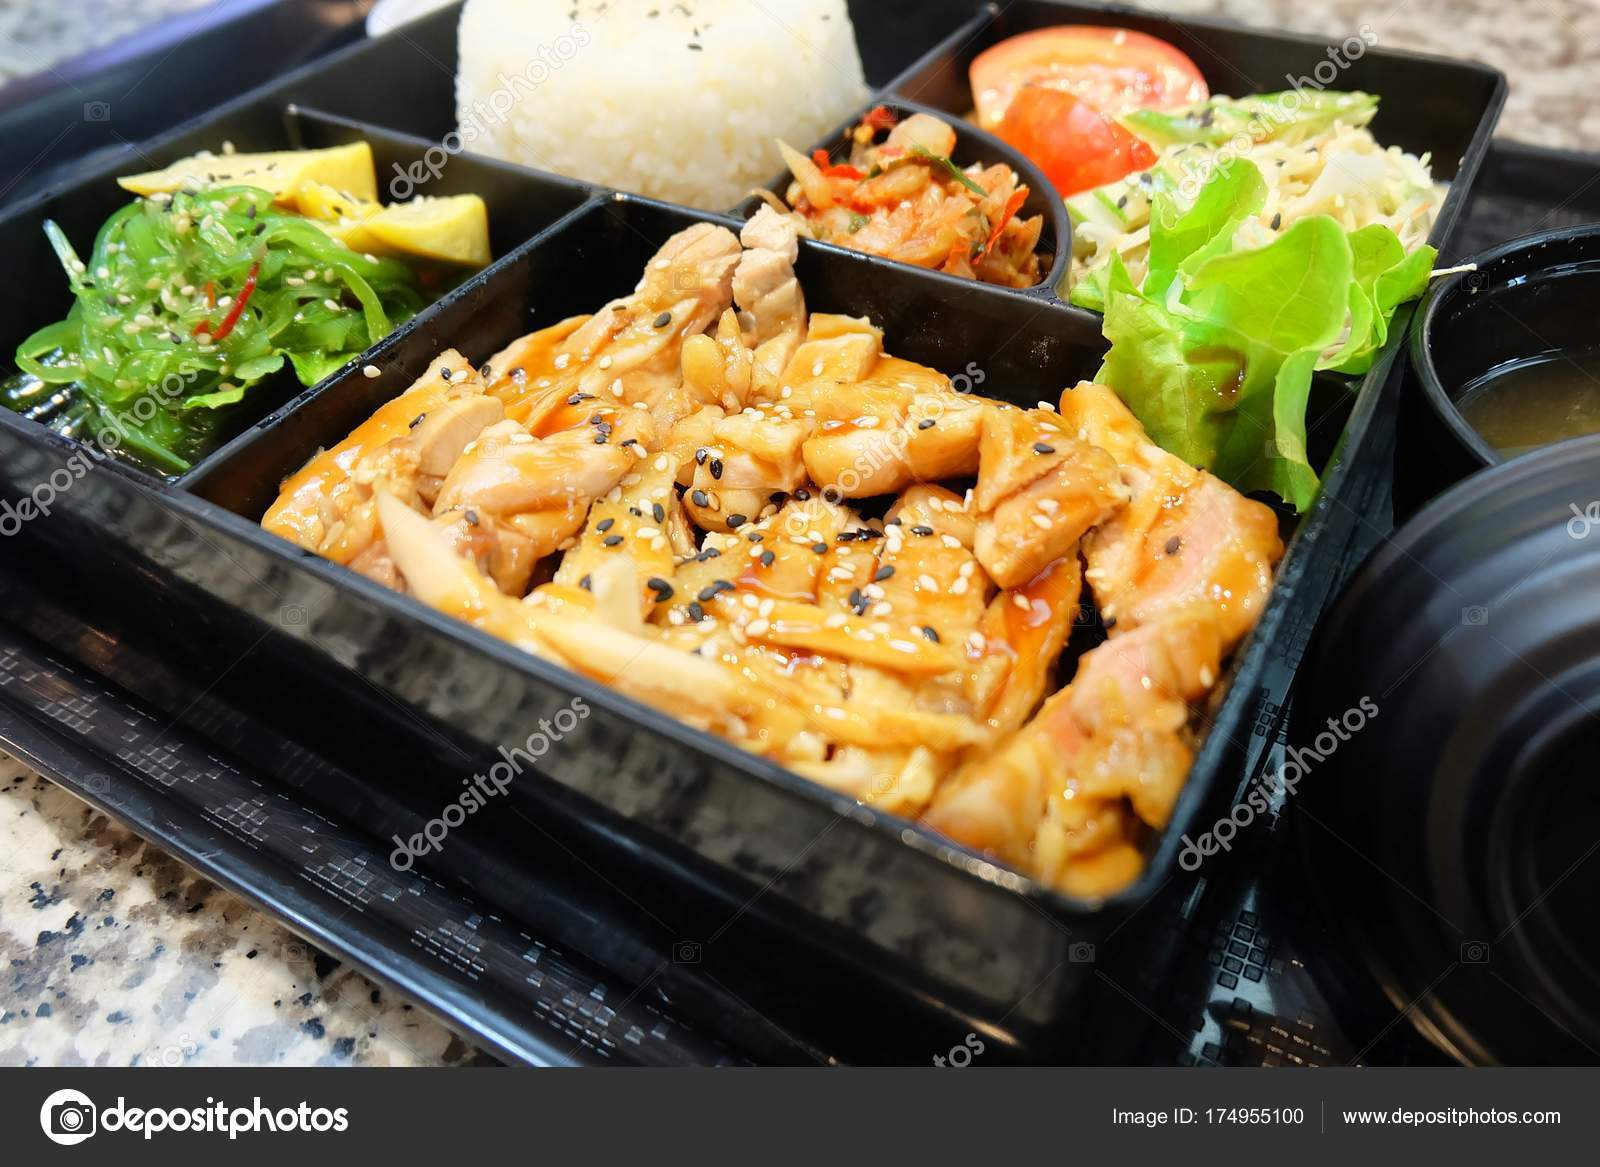 Delicious Japanese Bento Box With Teriyaki Chicken Stock Photo